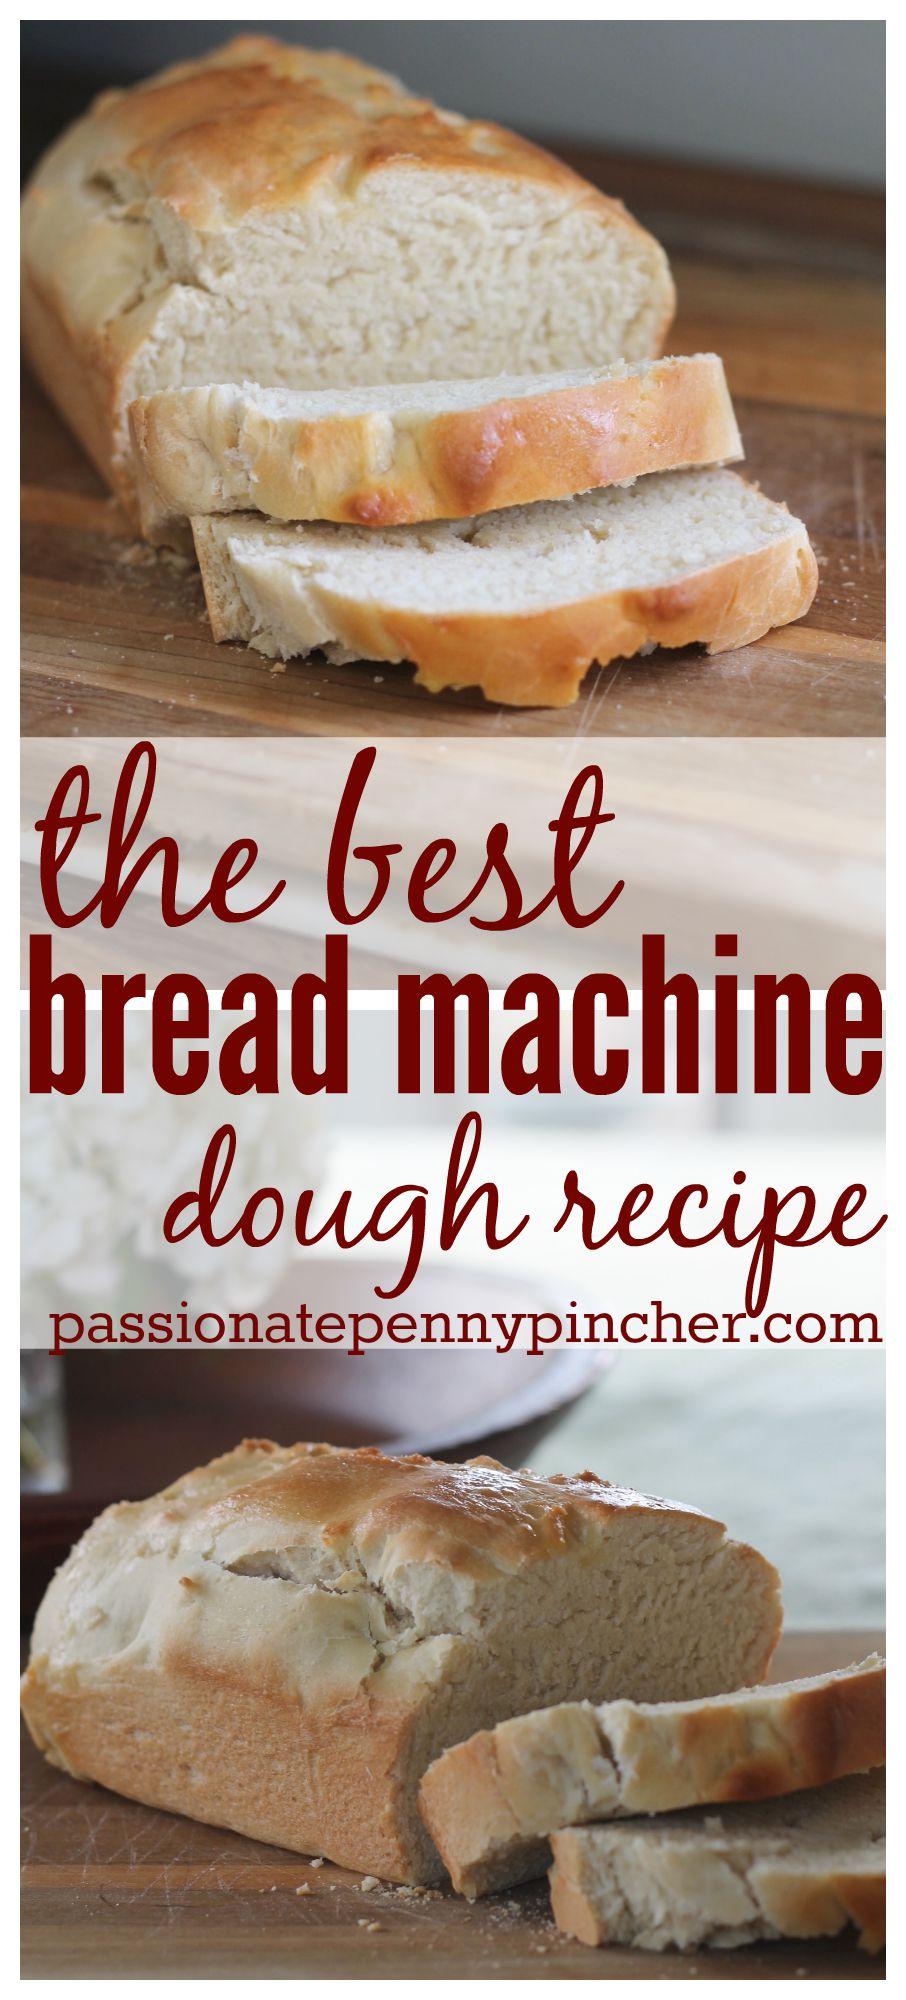 breadpinimage | Best bread machine, Bread maker recipes ...